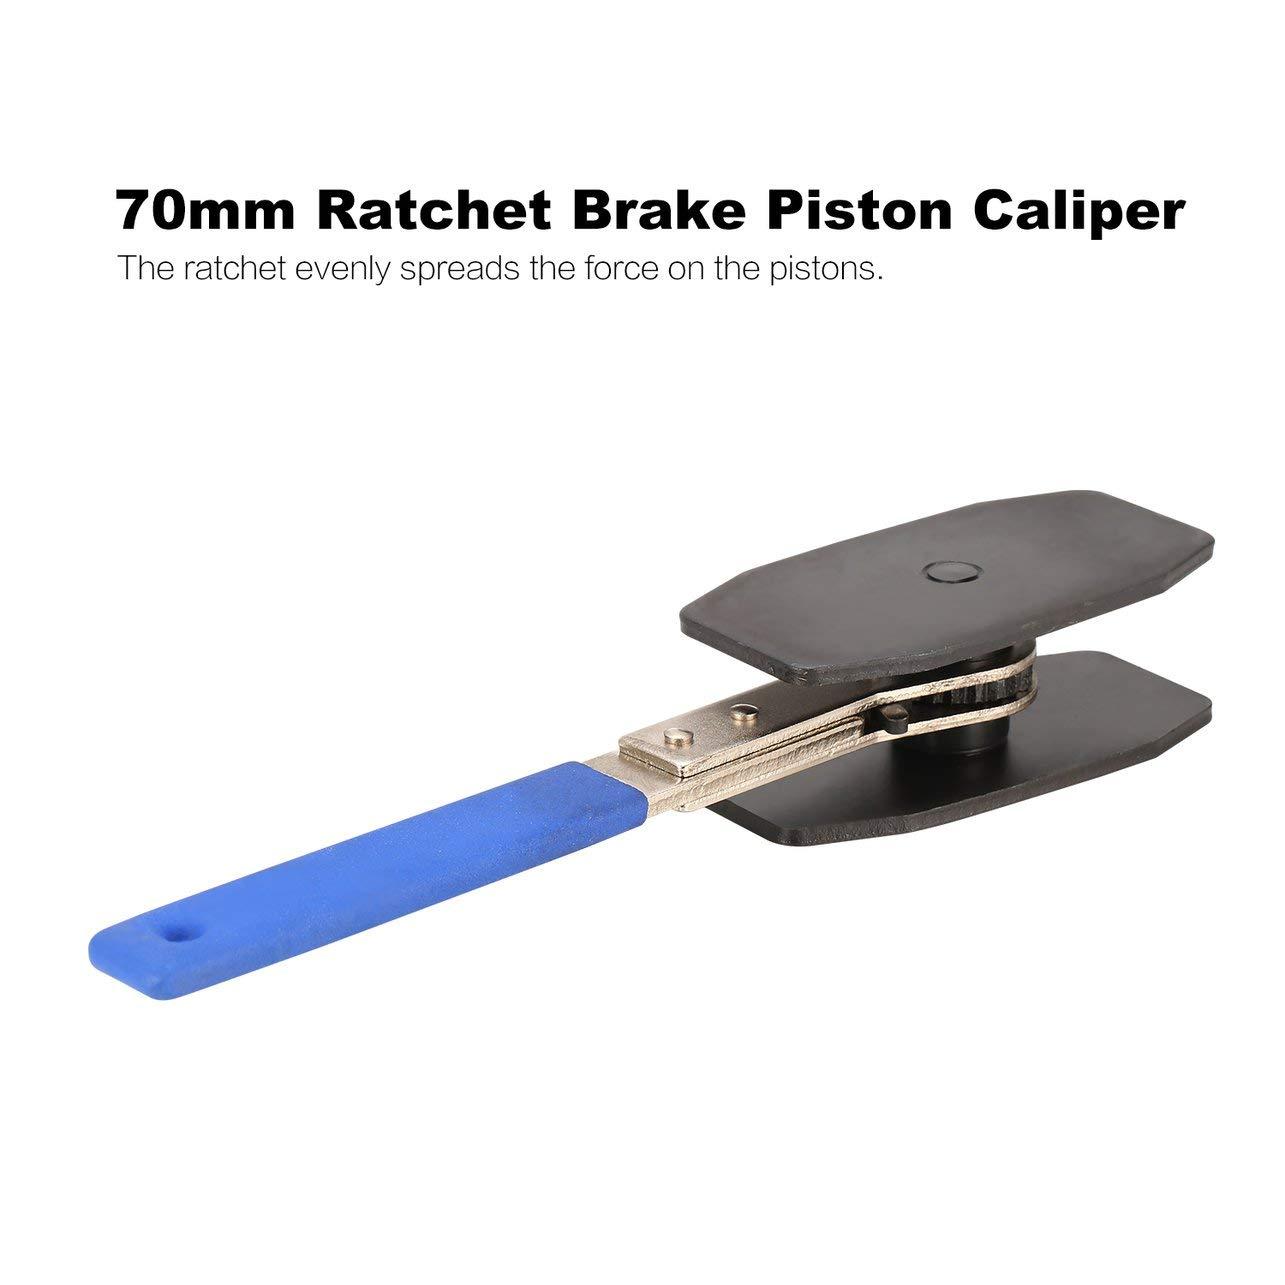 Farbe: blau 270mm Auto Ratchet Bremskolben Caliper Spreizwerkzeug Kompressor Auto Autoschl/üssel Press Einzel Twin Quad Pistons Install Tool